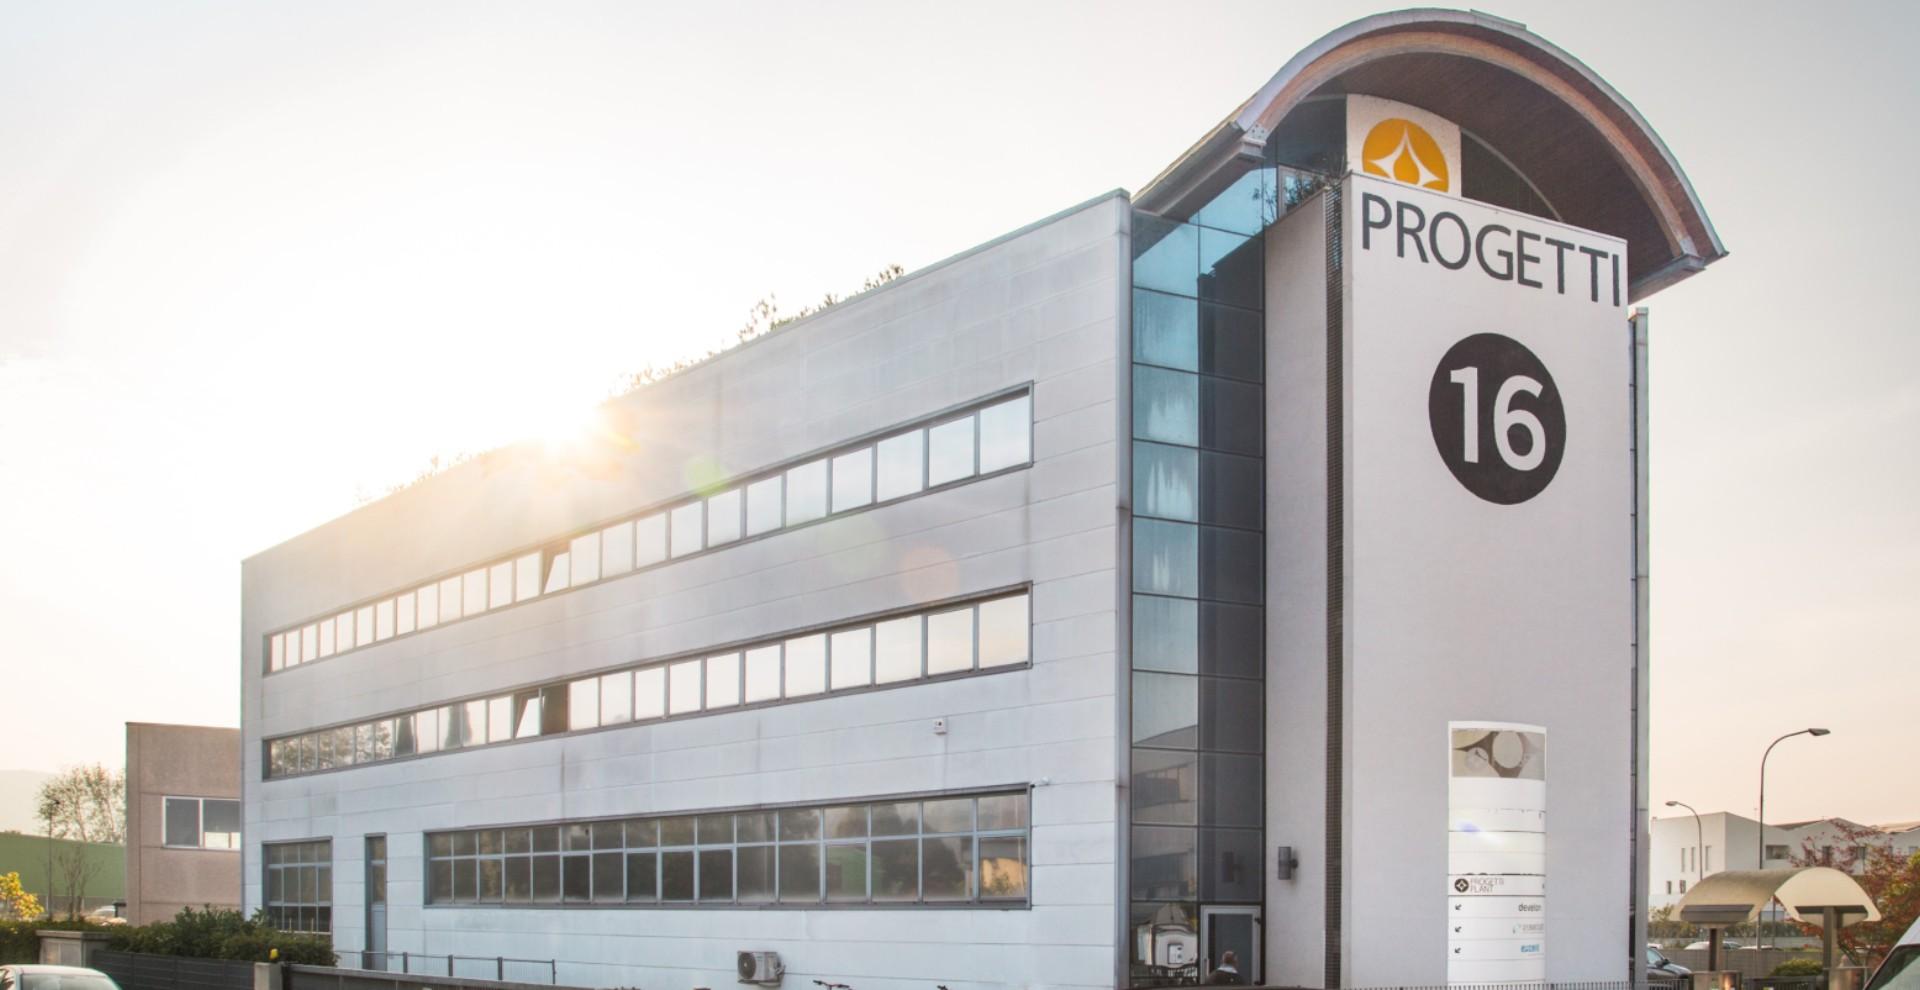 progetti-has-a-new-face-corporate-building